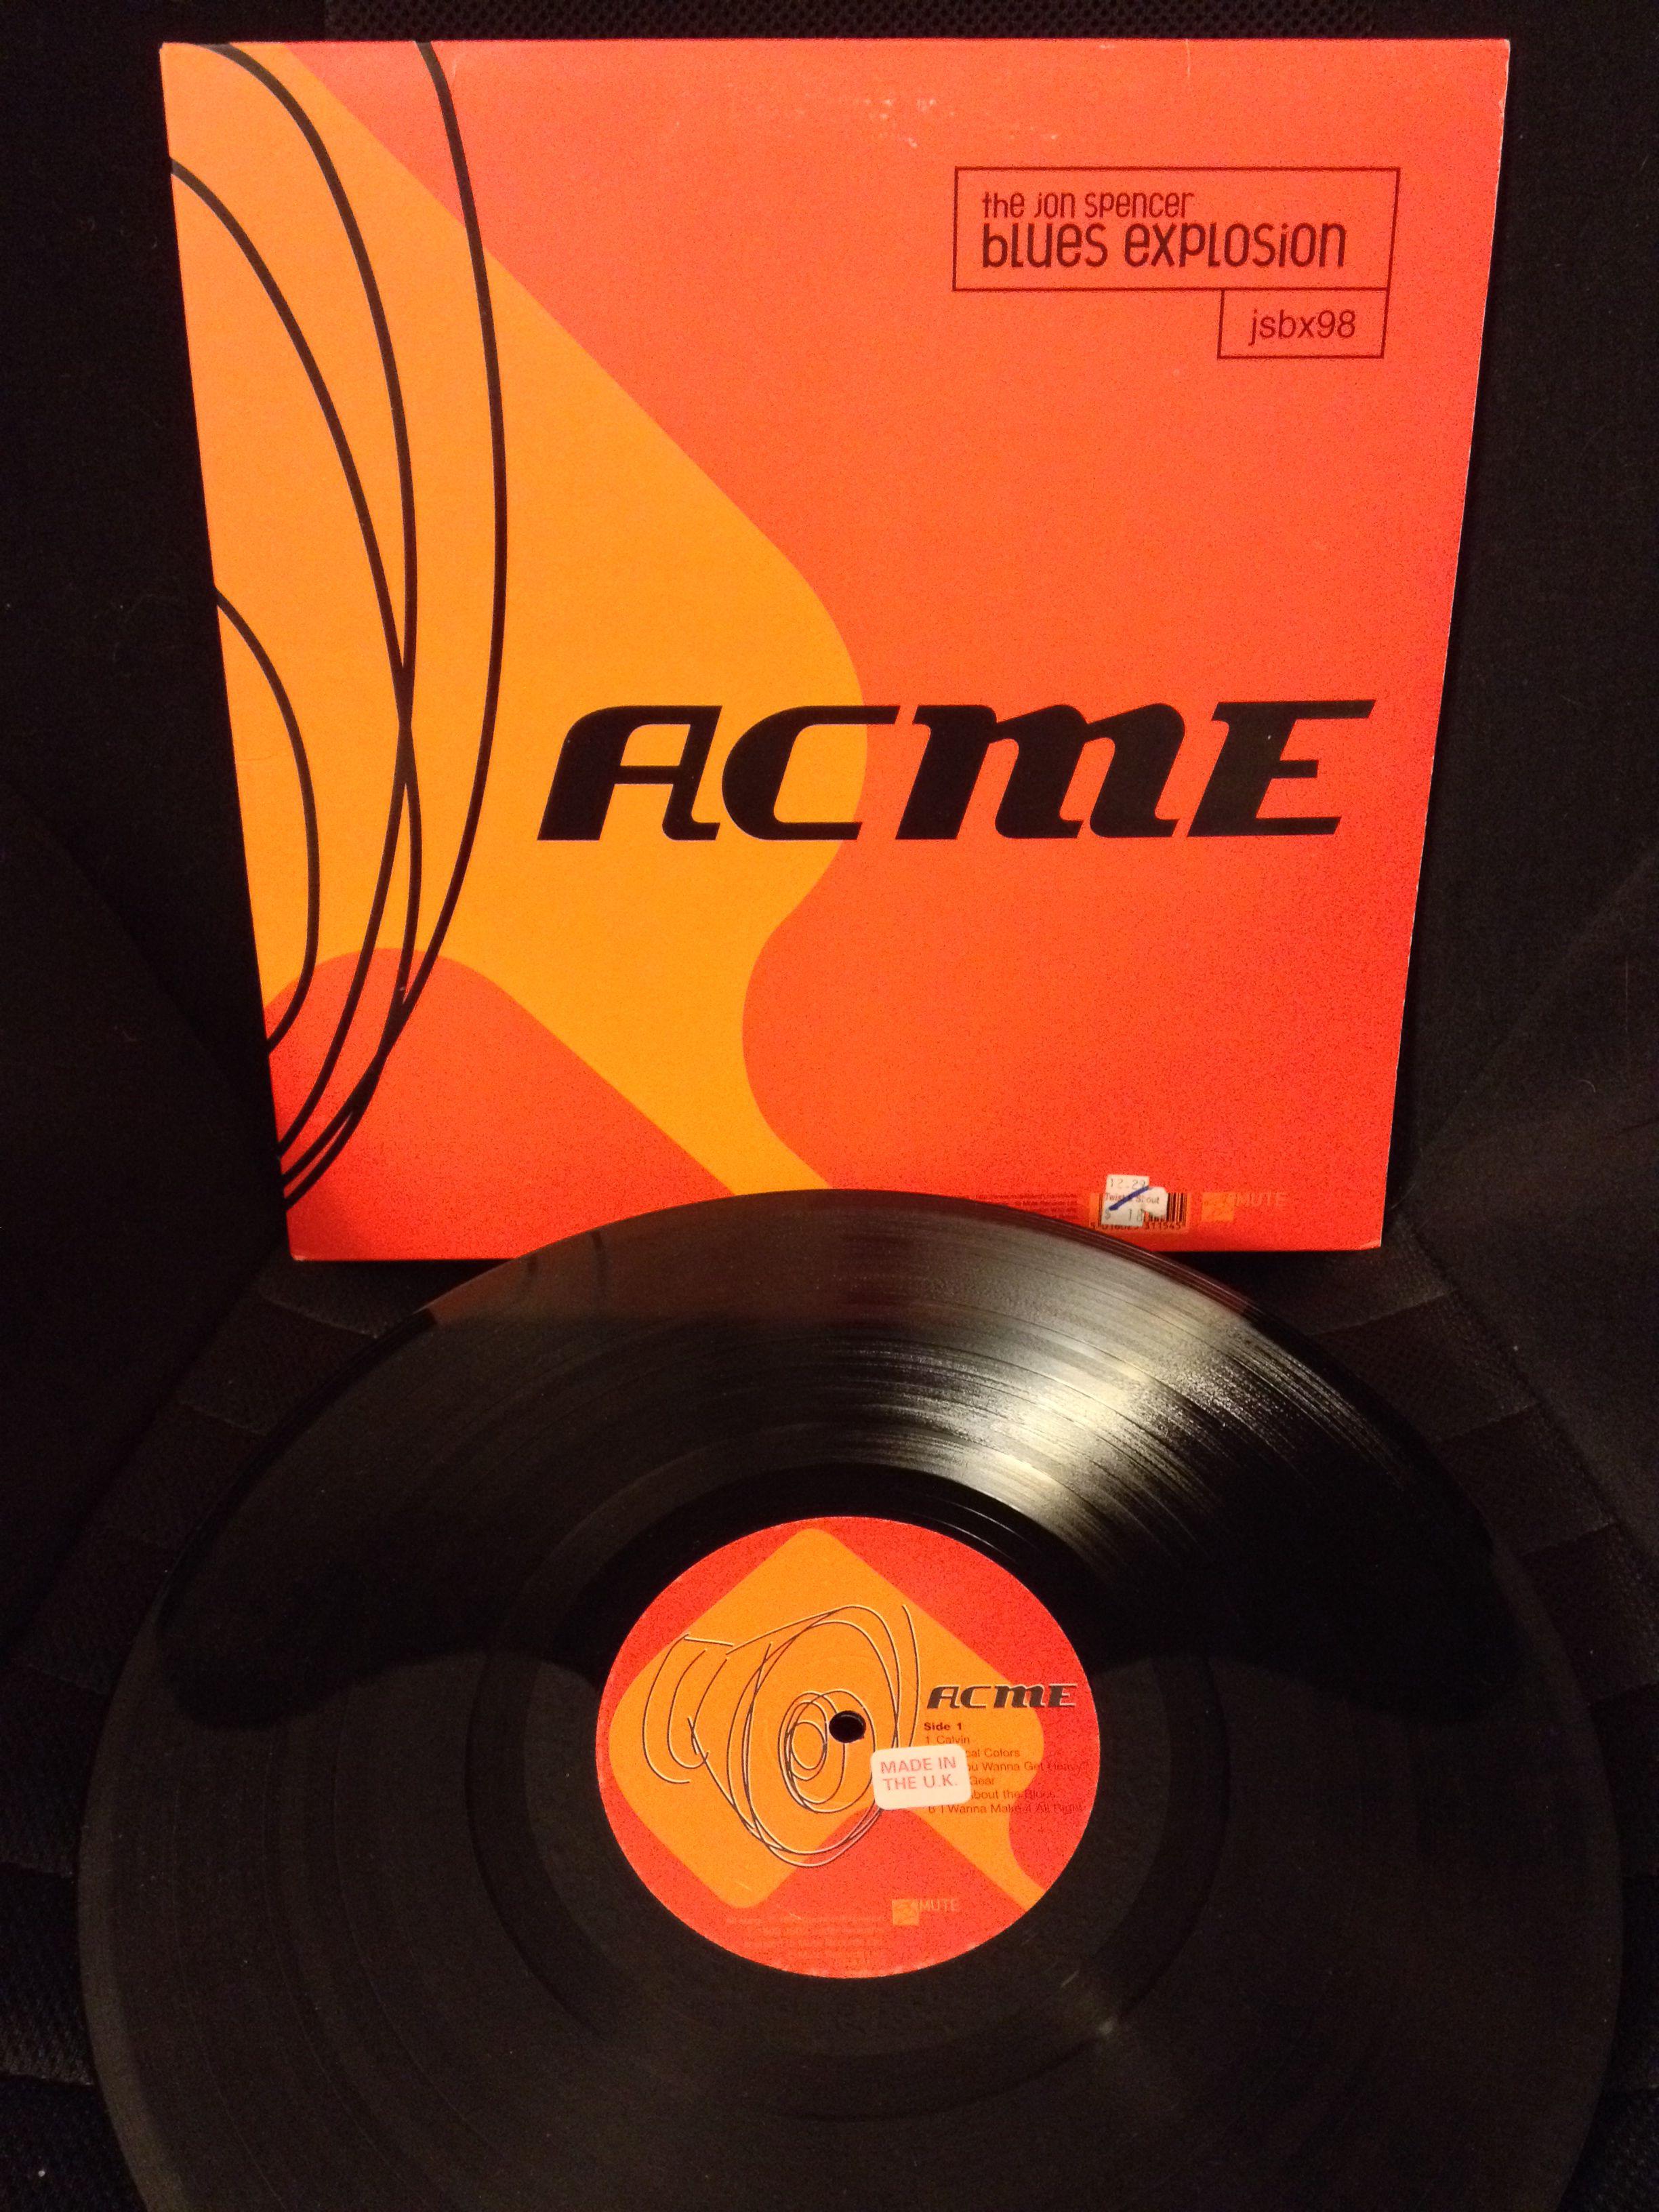 The Jon Spencer Blues Explosion Acme Vinyl Records Blues Explosion